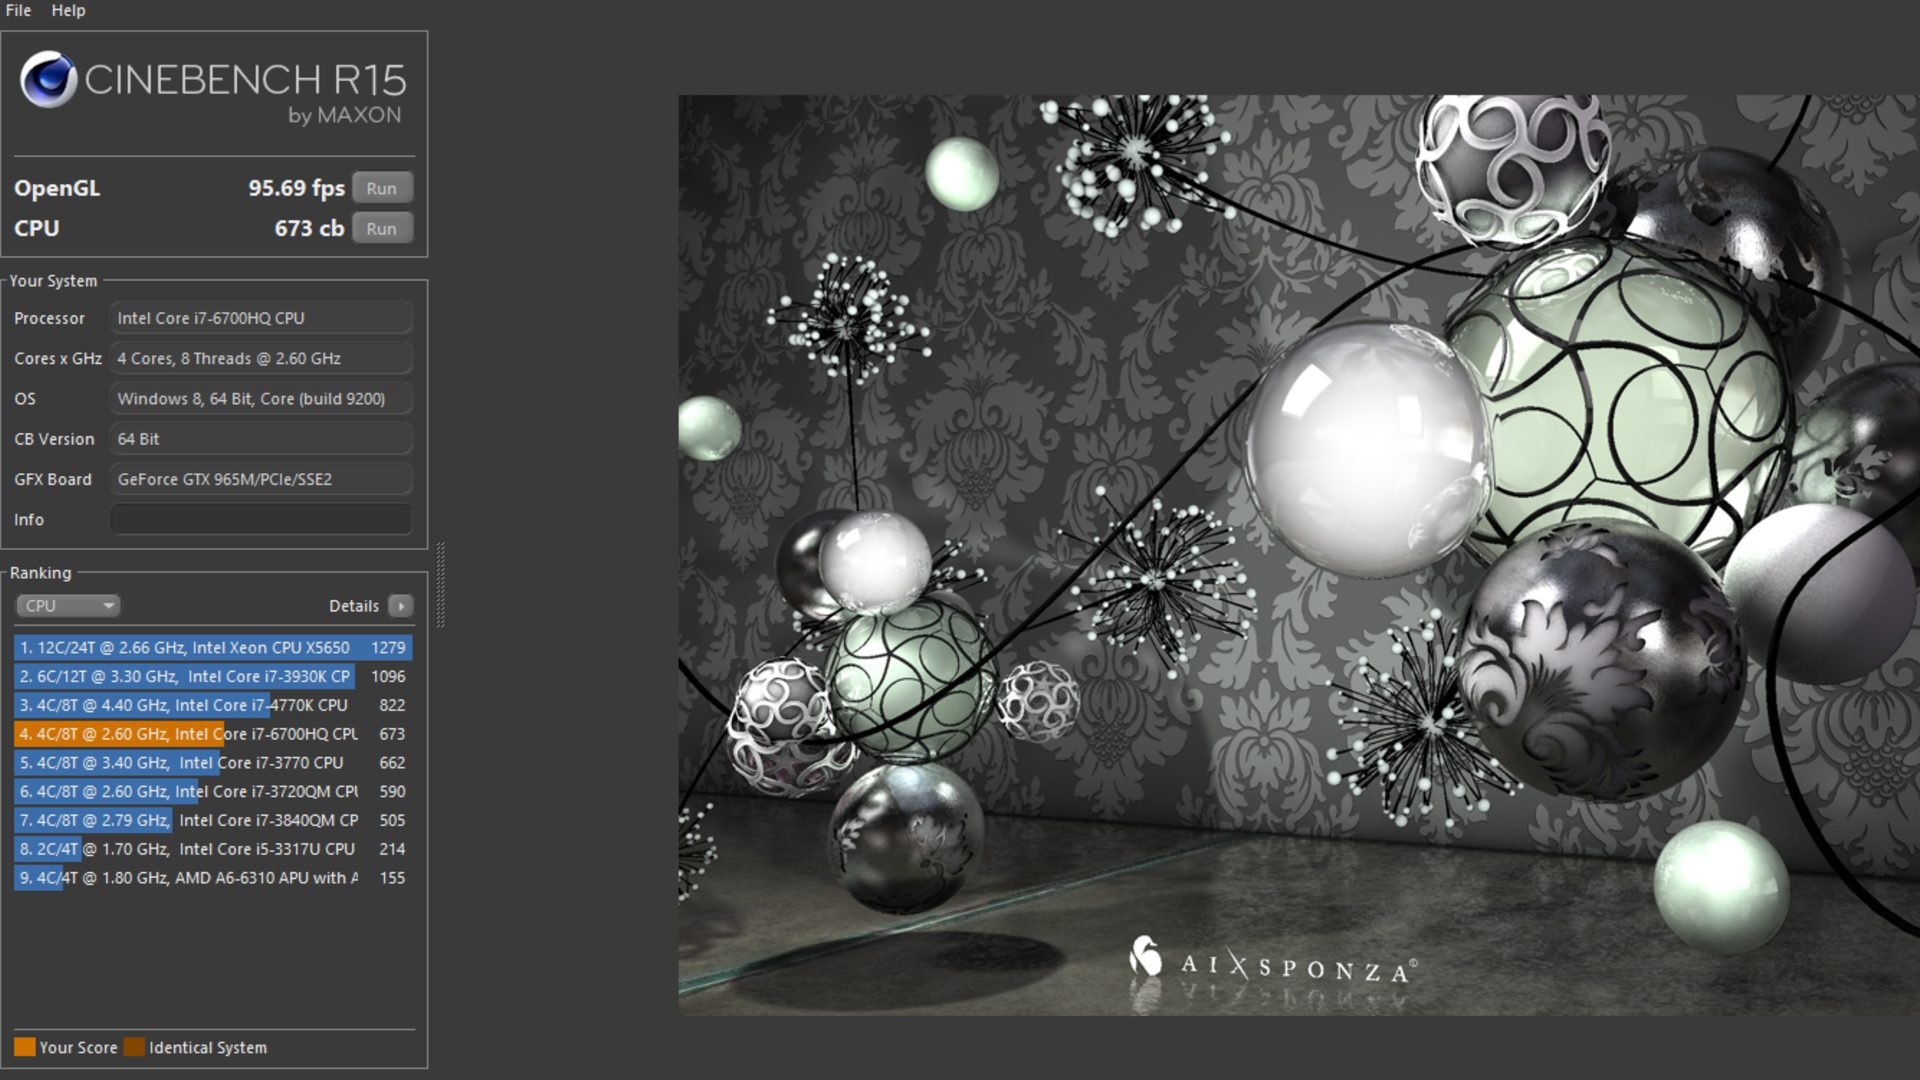 HP-OMEN-15-ax008ng – Cinebench-R15